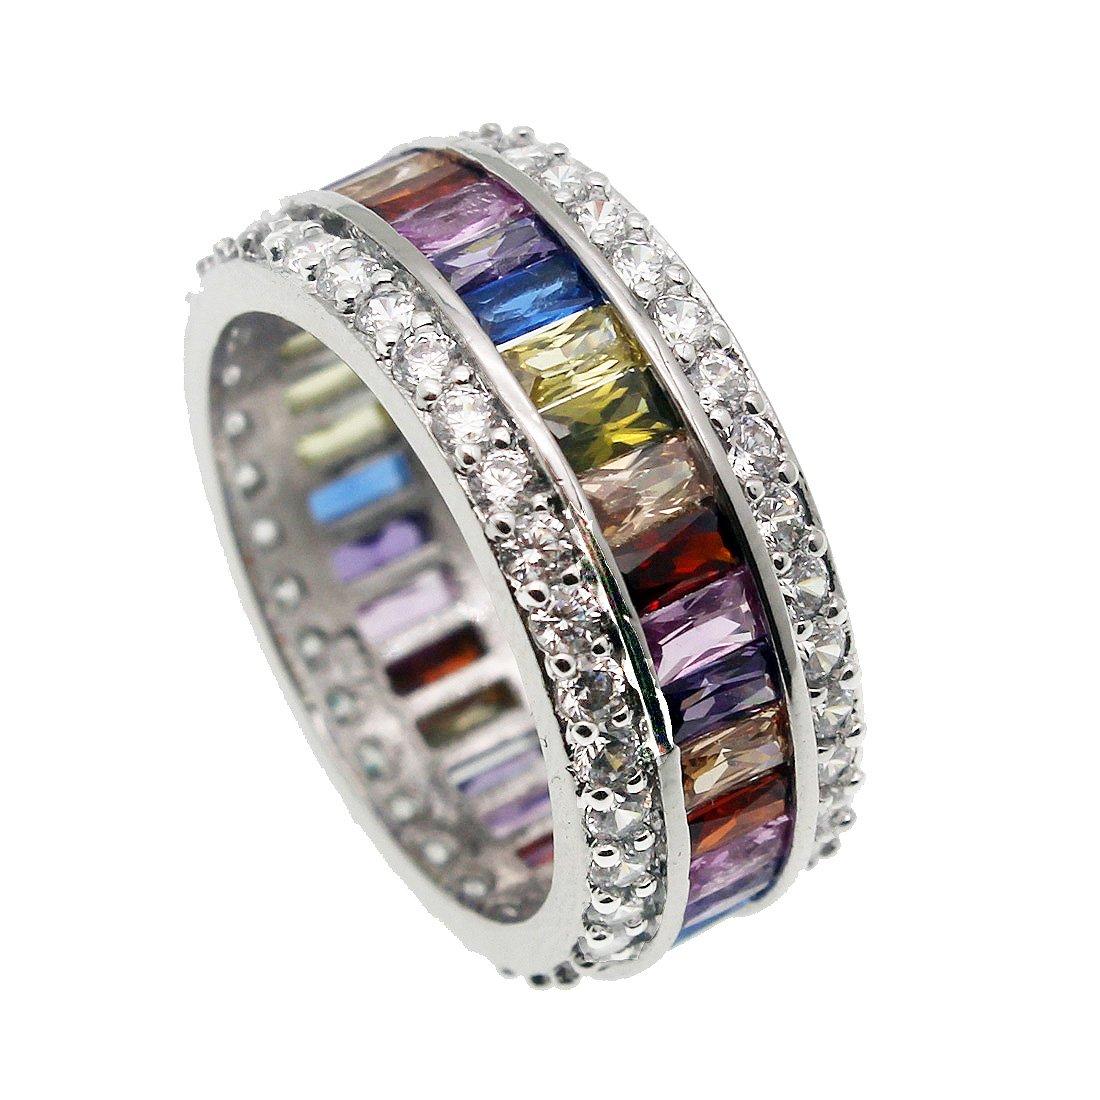 Hermosa Gemstone Ring Morganite Garnet Amethyst Aquamarine Ruby Topaz Women Jewelry Size 6 7 8 9 10 11 12 (12)